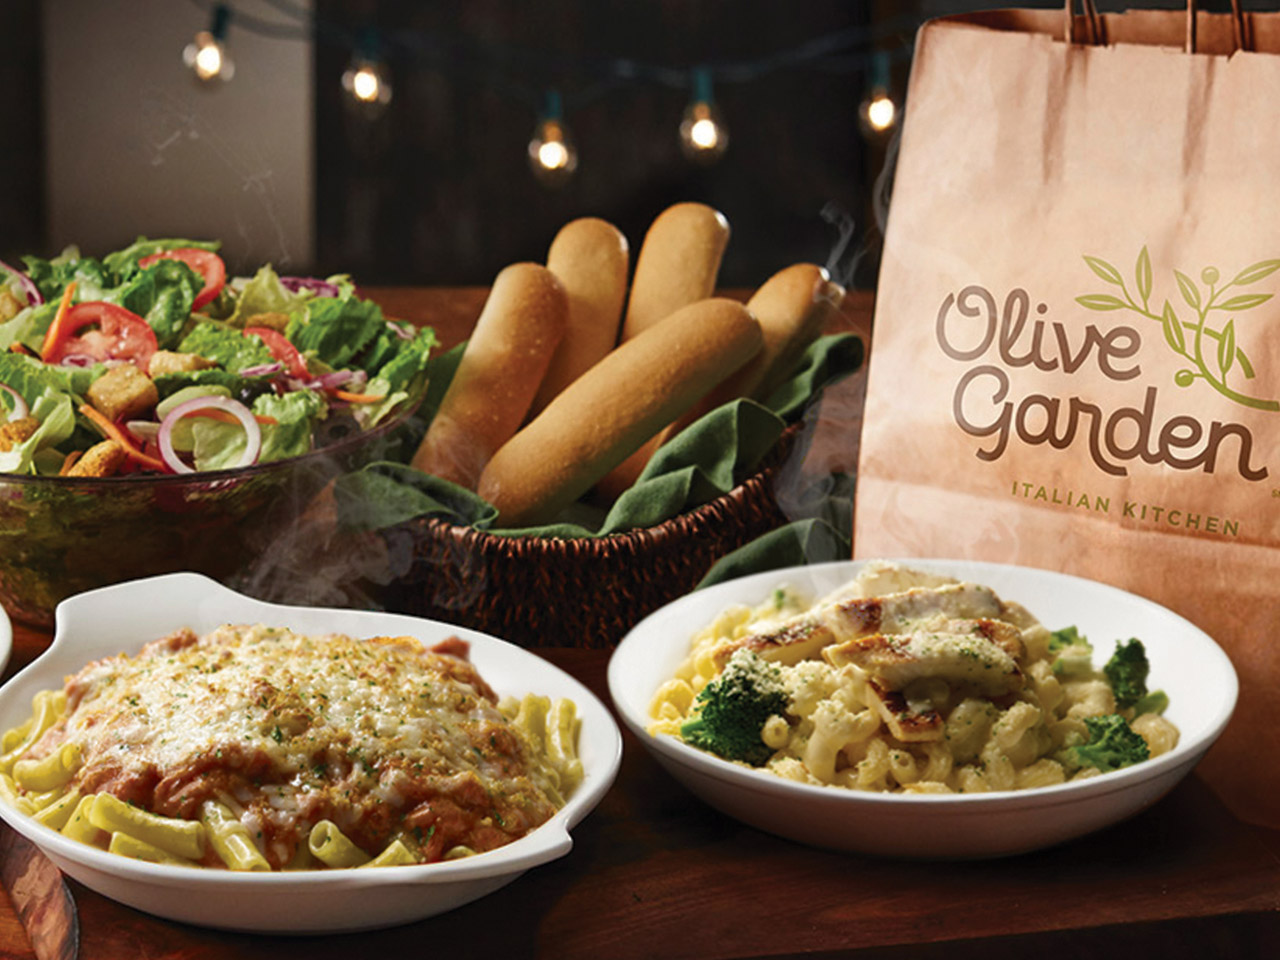 Olive Garden Italian Restaurant 770 SE Oralabor Rd, Ankeny, IA 50021 ...